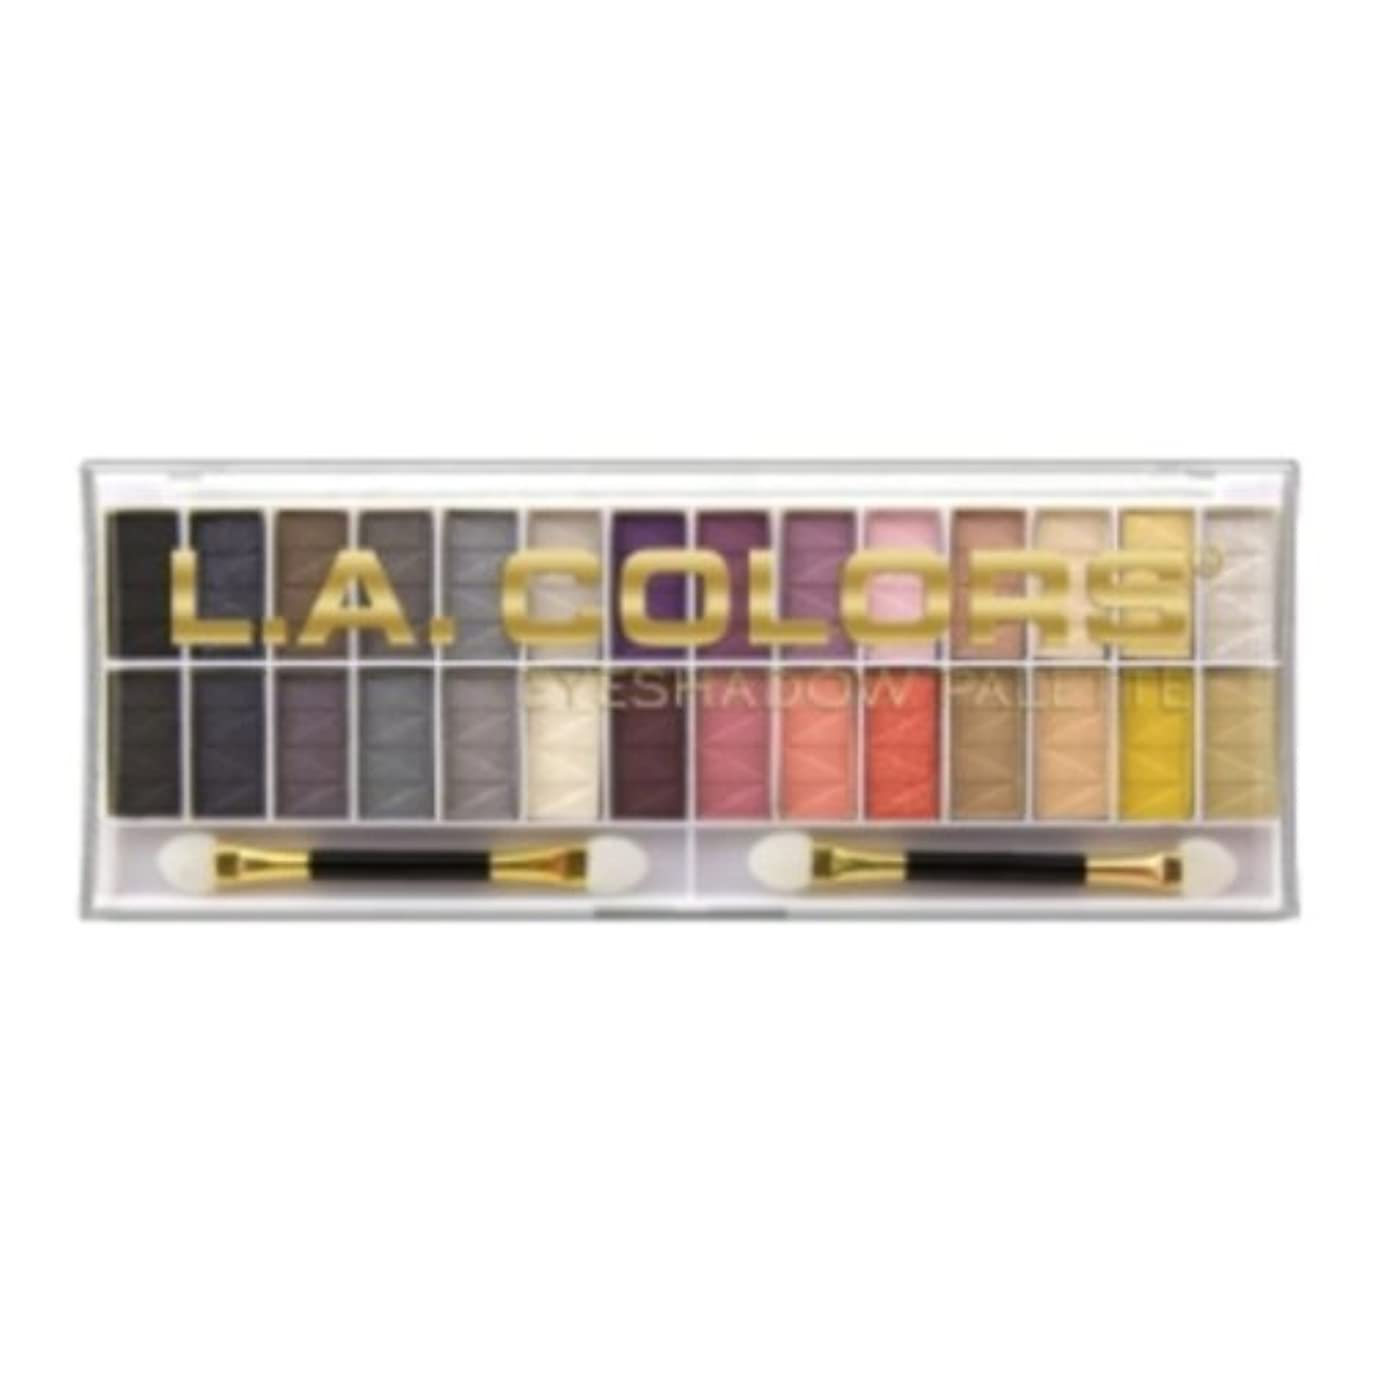 L.A. COLORS 28 Color Eyeshadow Palette - Malibu (並行輸入品)